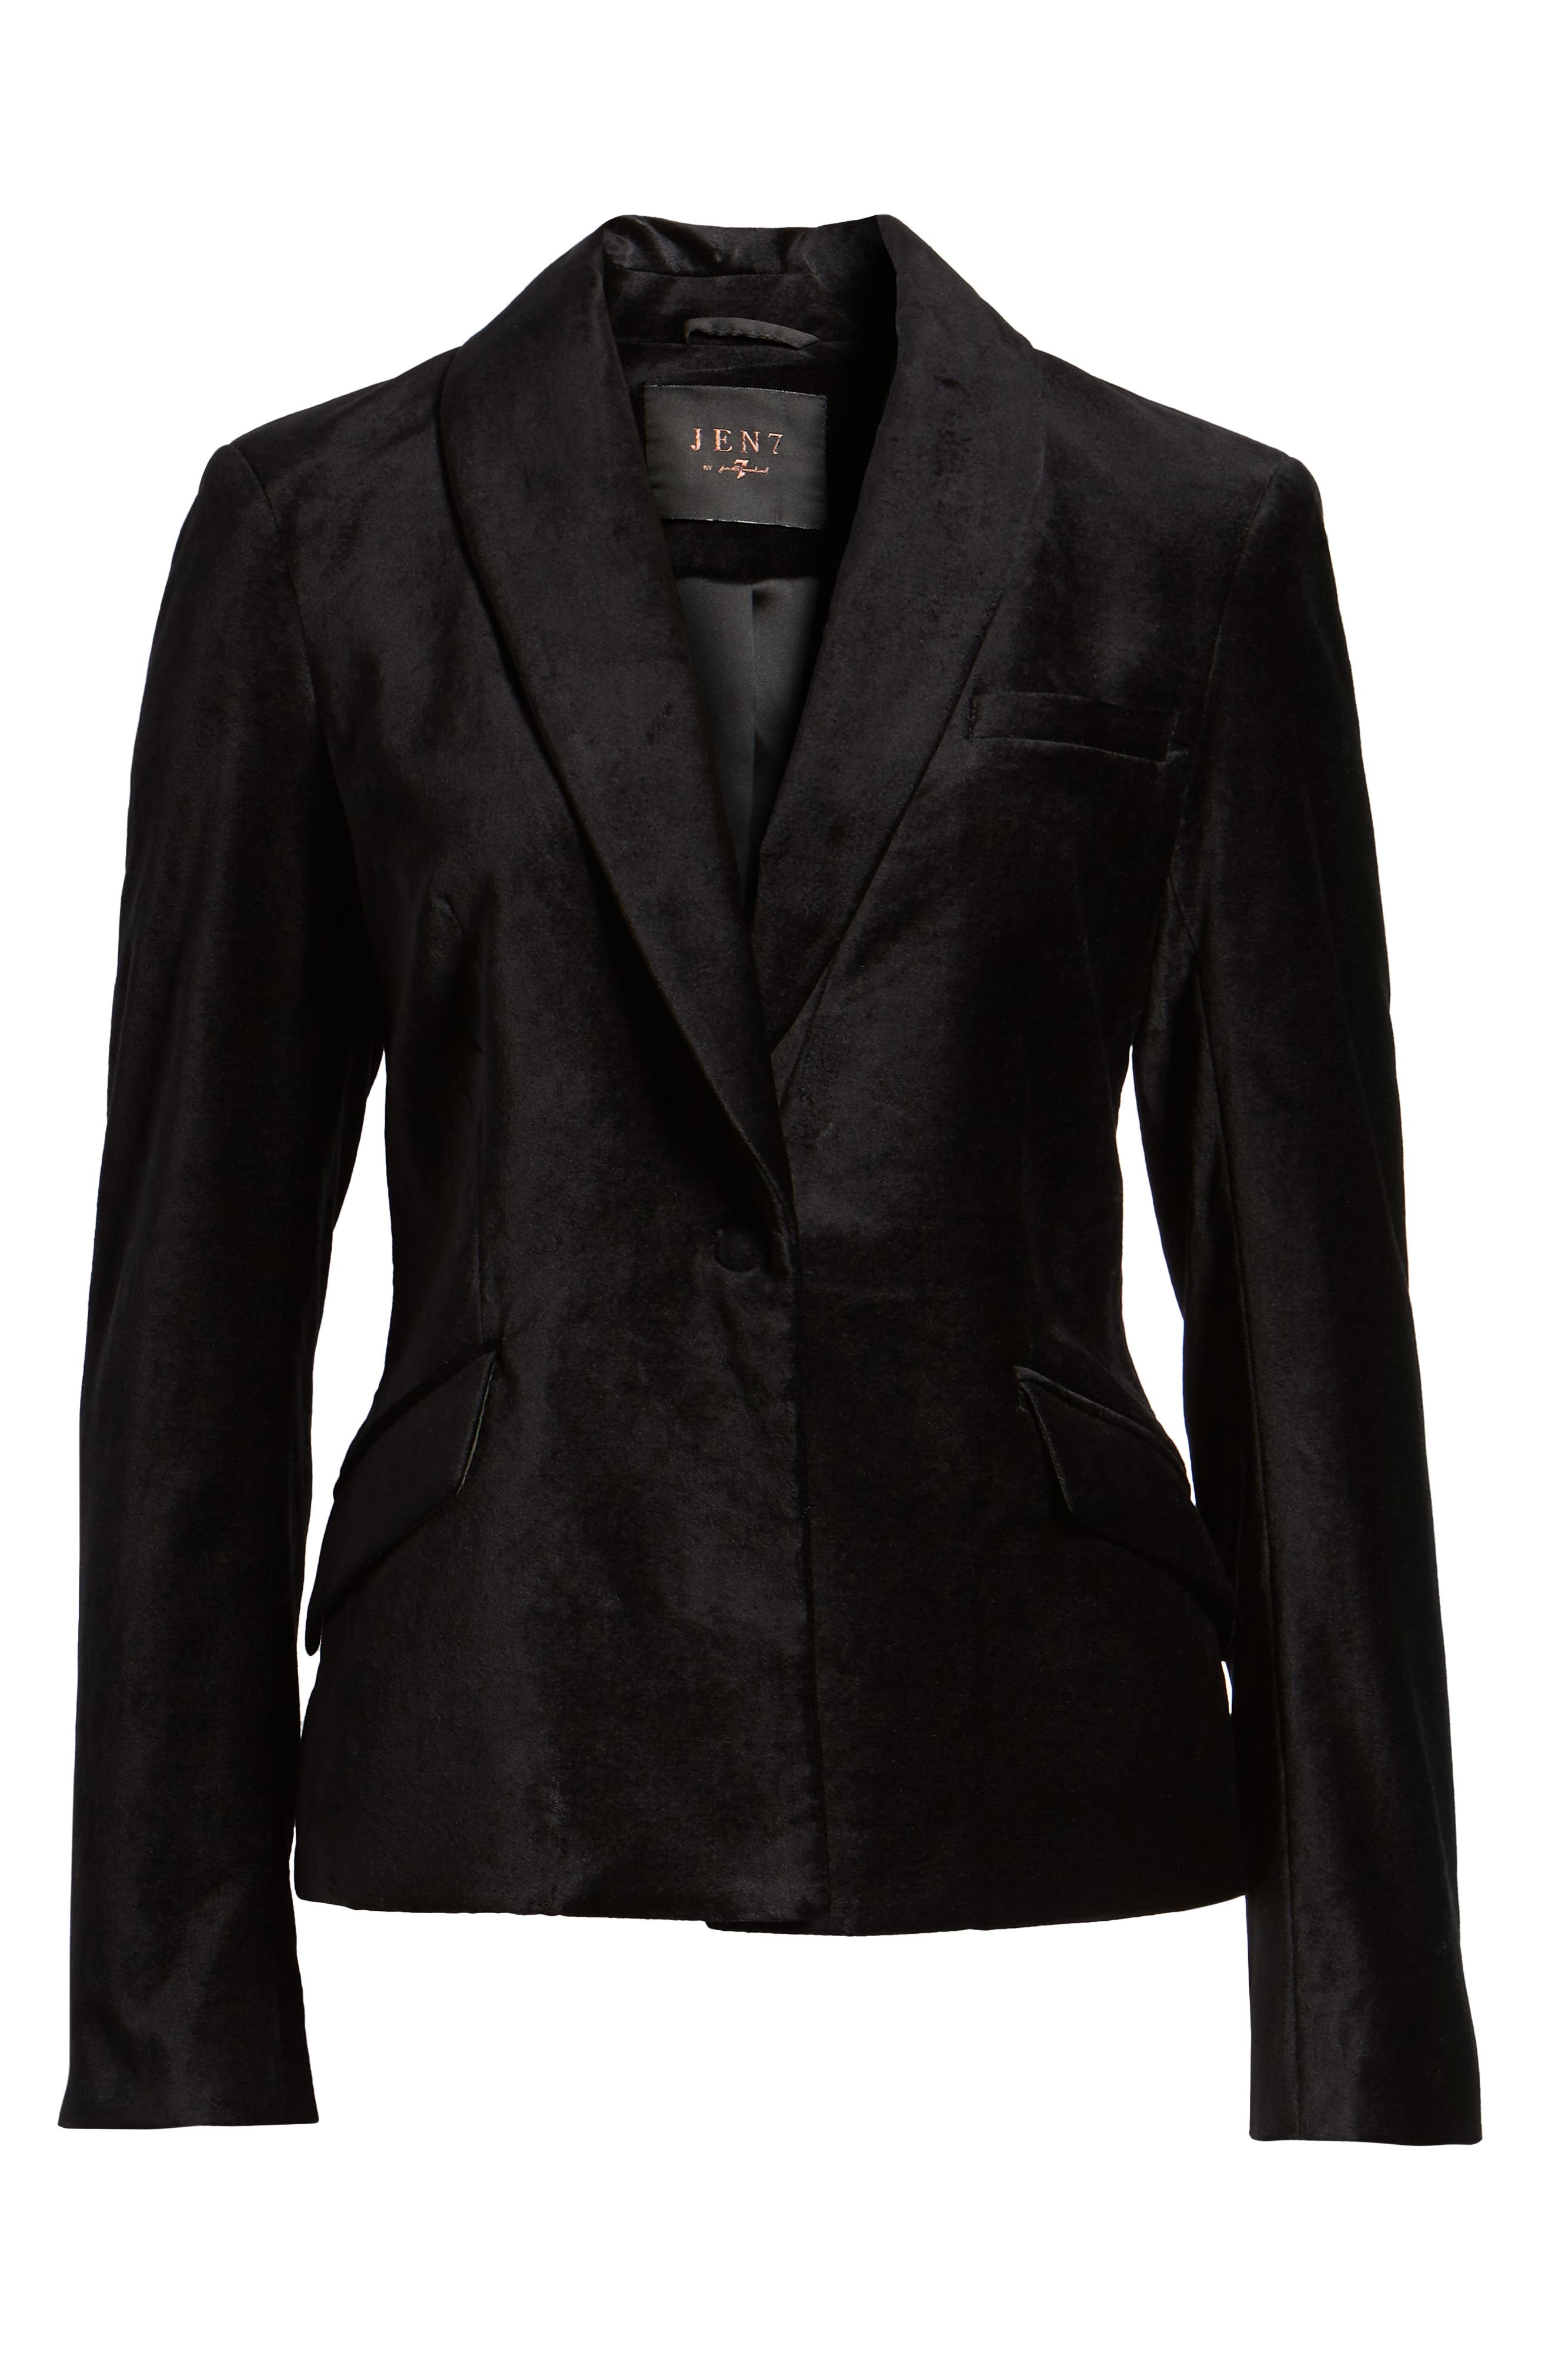 JEN7 BY 7 FOR ALL MANKIND, Stretch Cotton Velvet Blazer, Alternate thumbnail 6, color, BLACK